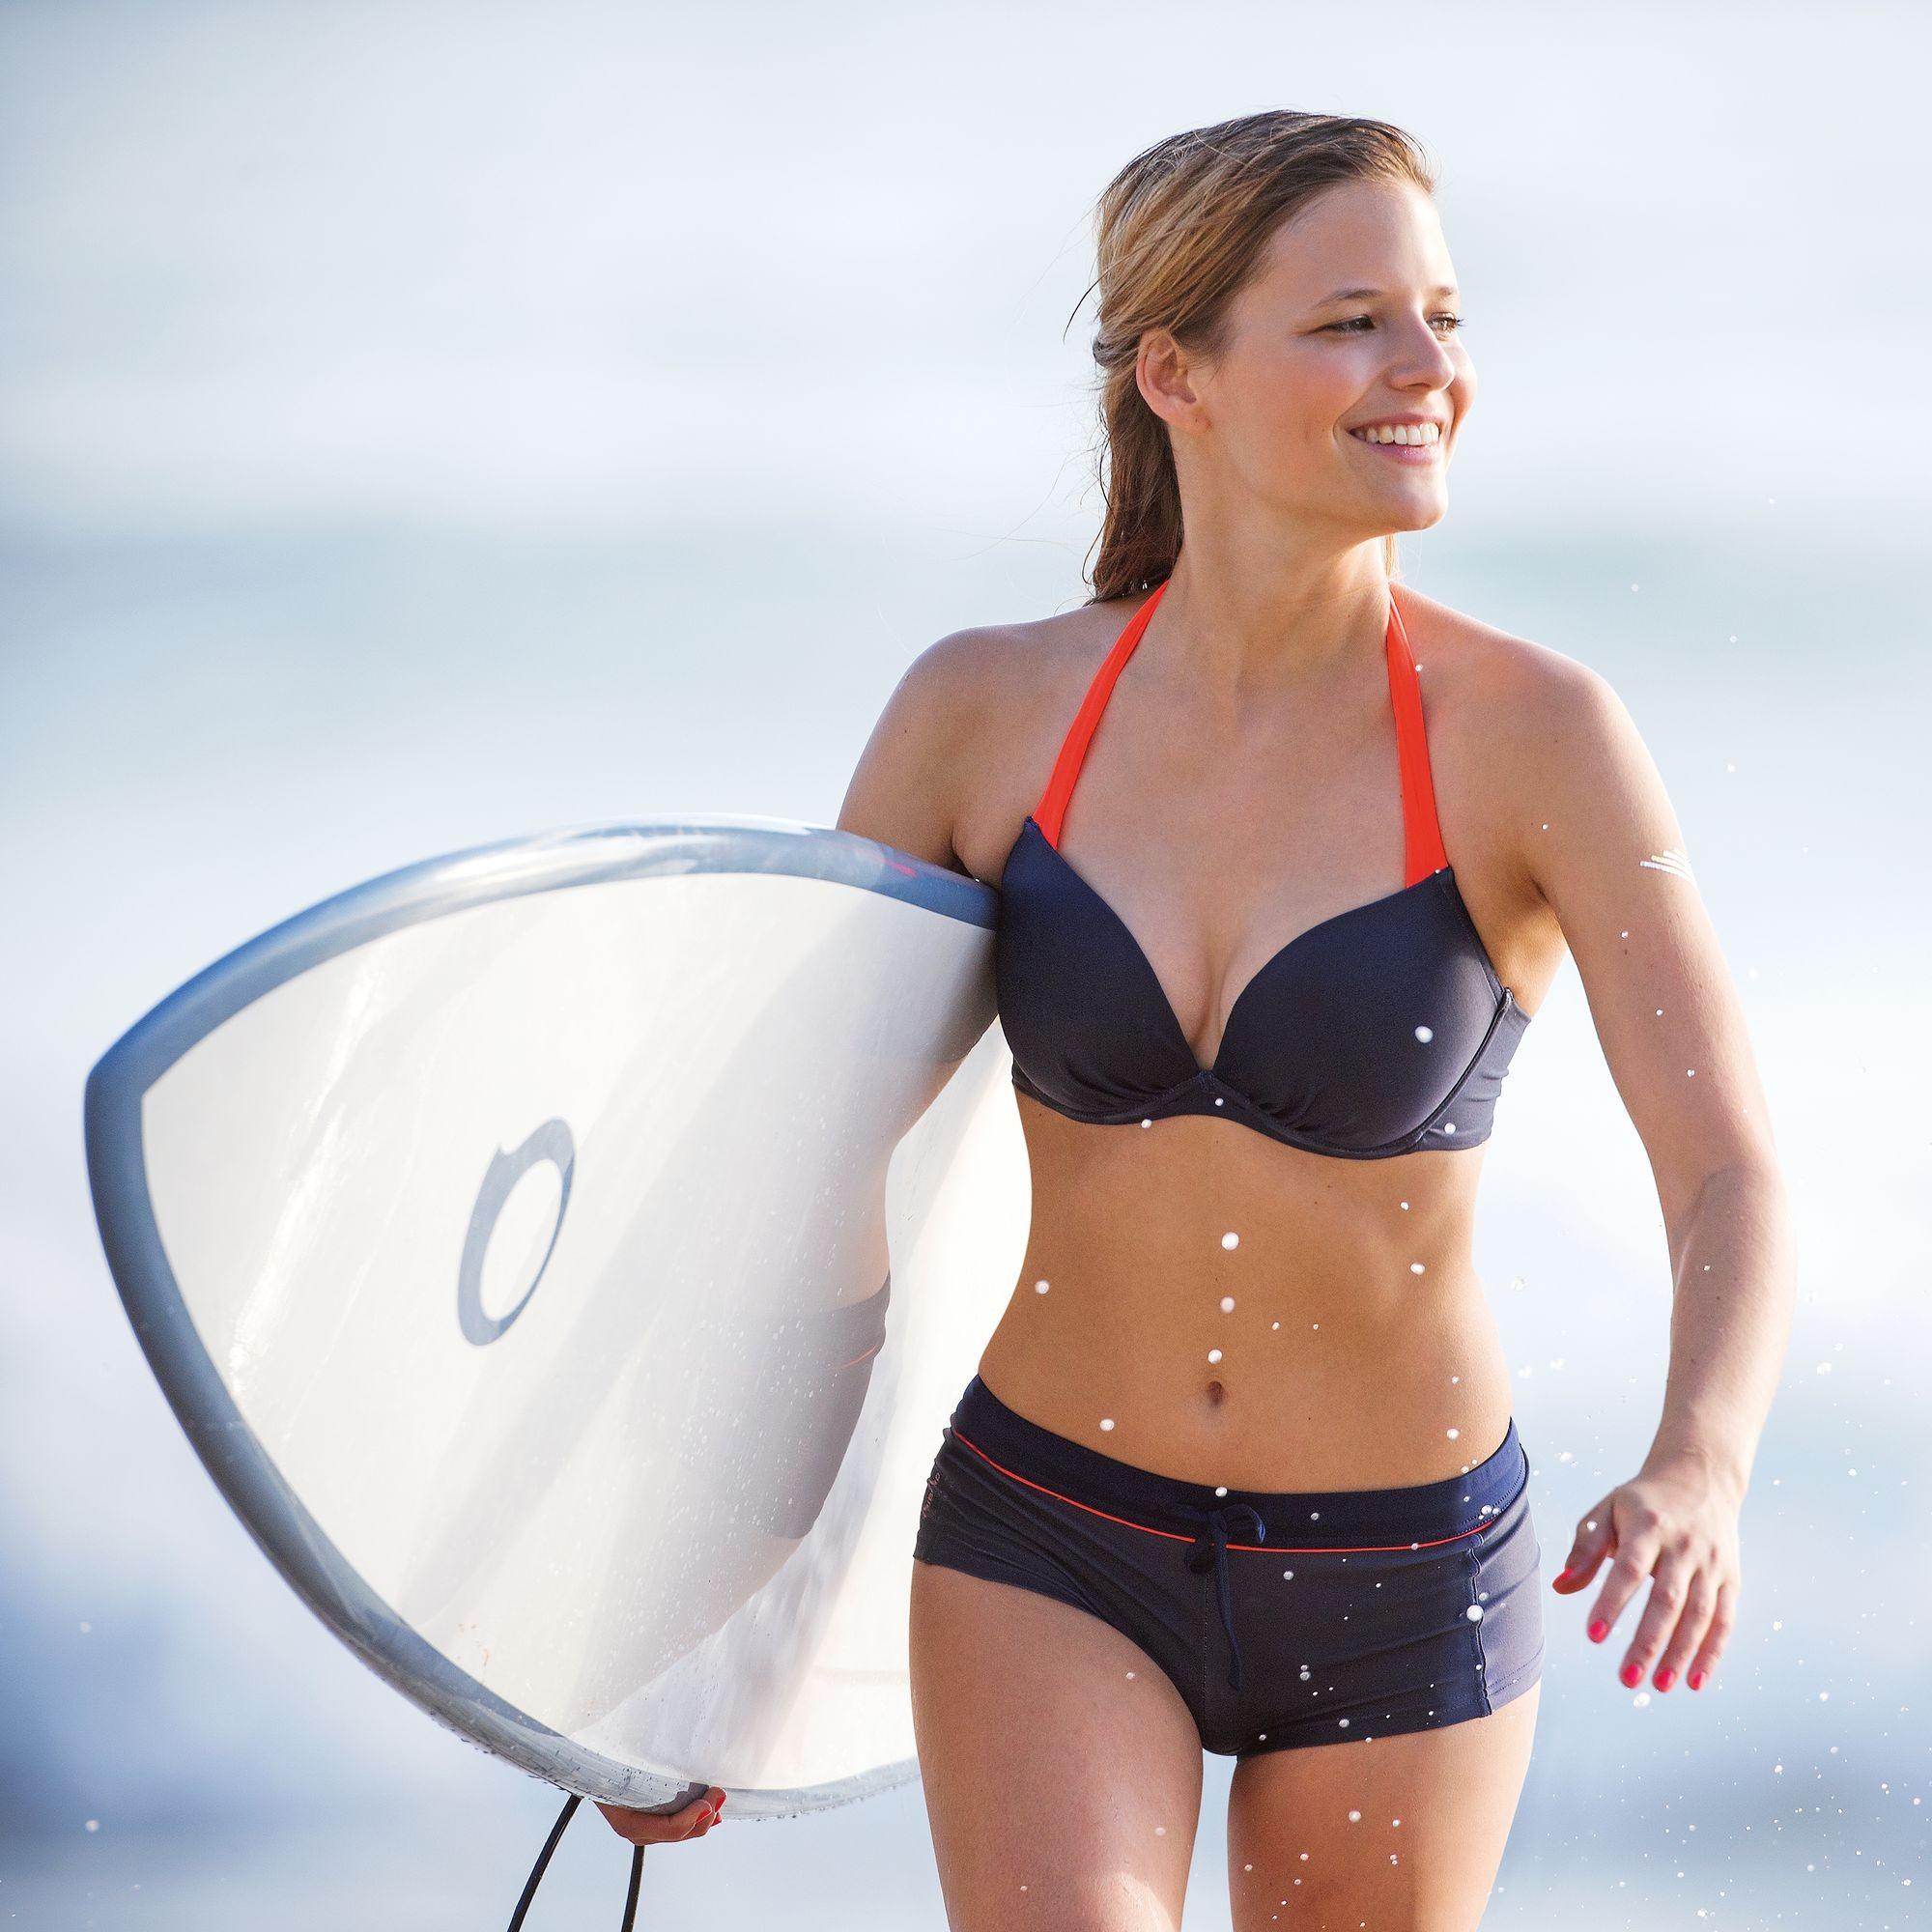 Bikini Decathlon con pantaloncino